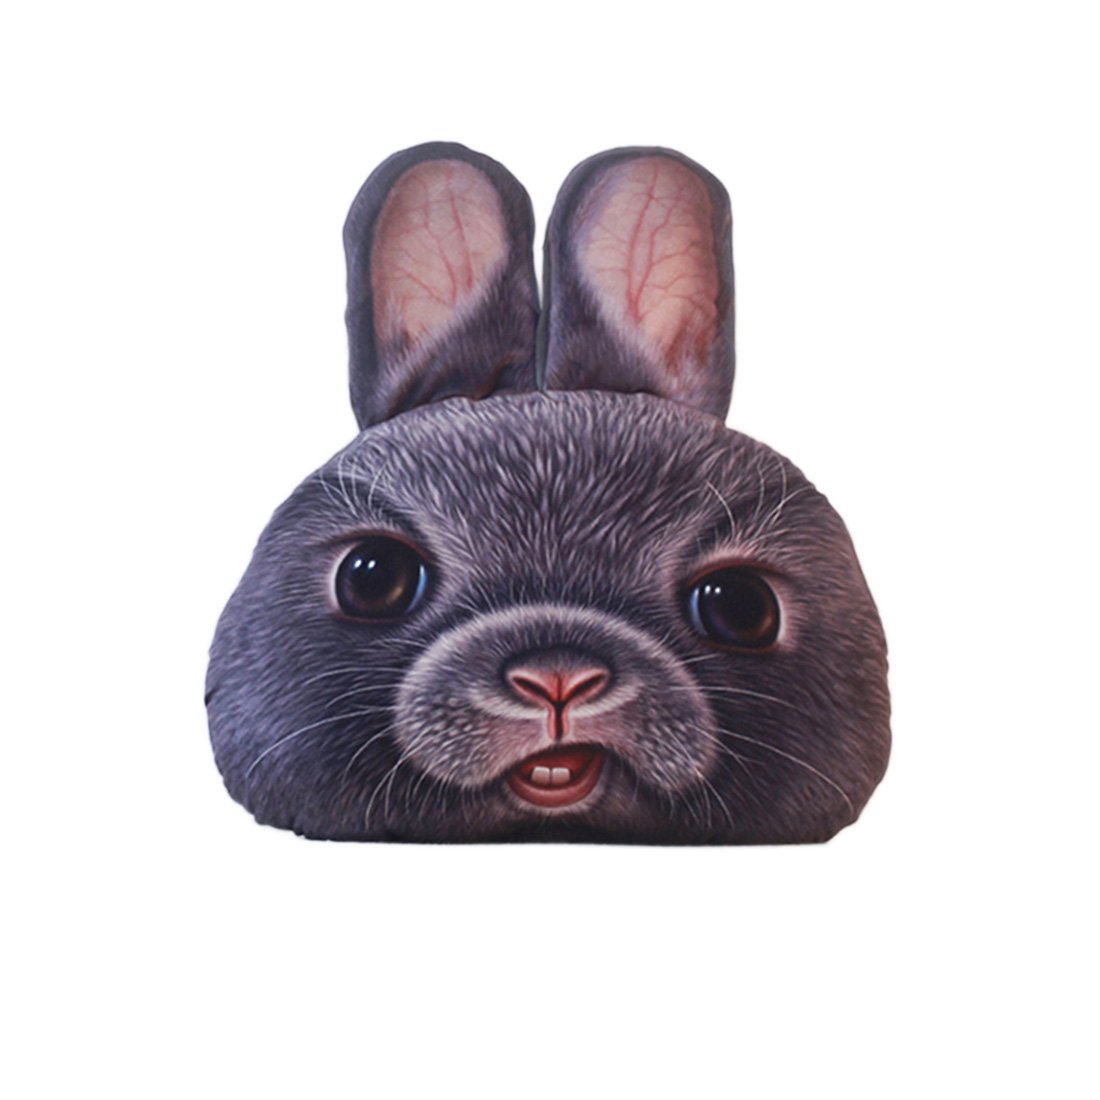 Beneking 3D Printed Animal Round Cushion Pillow Cute Plush Soft Toy Bear Rabbit Birthday Gift Trick Toys Car Home Office